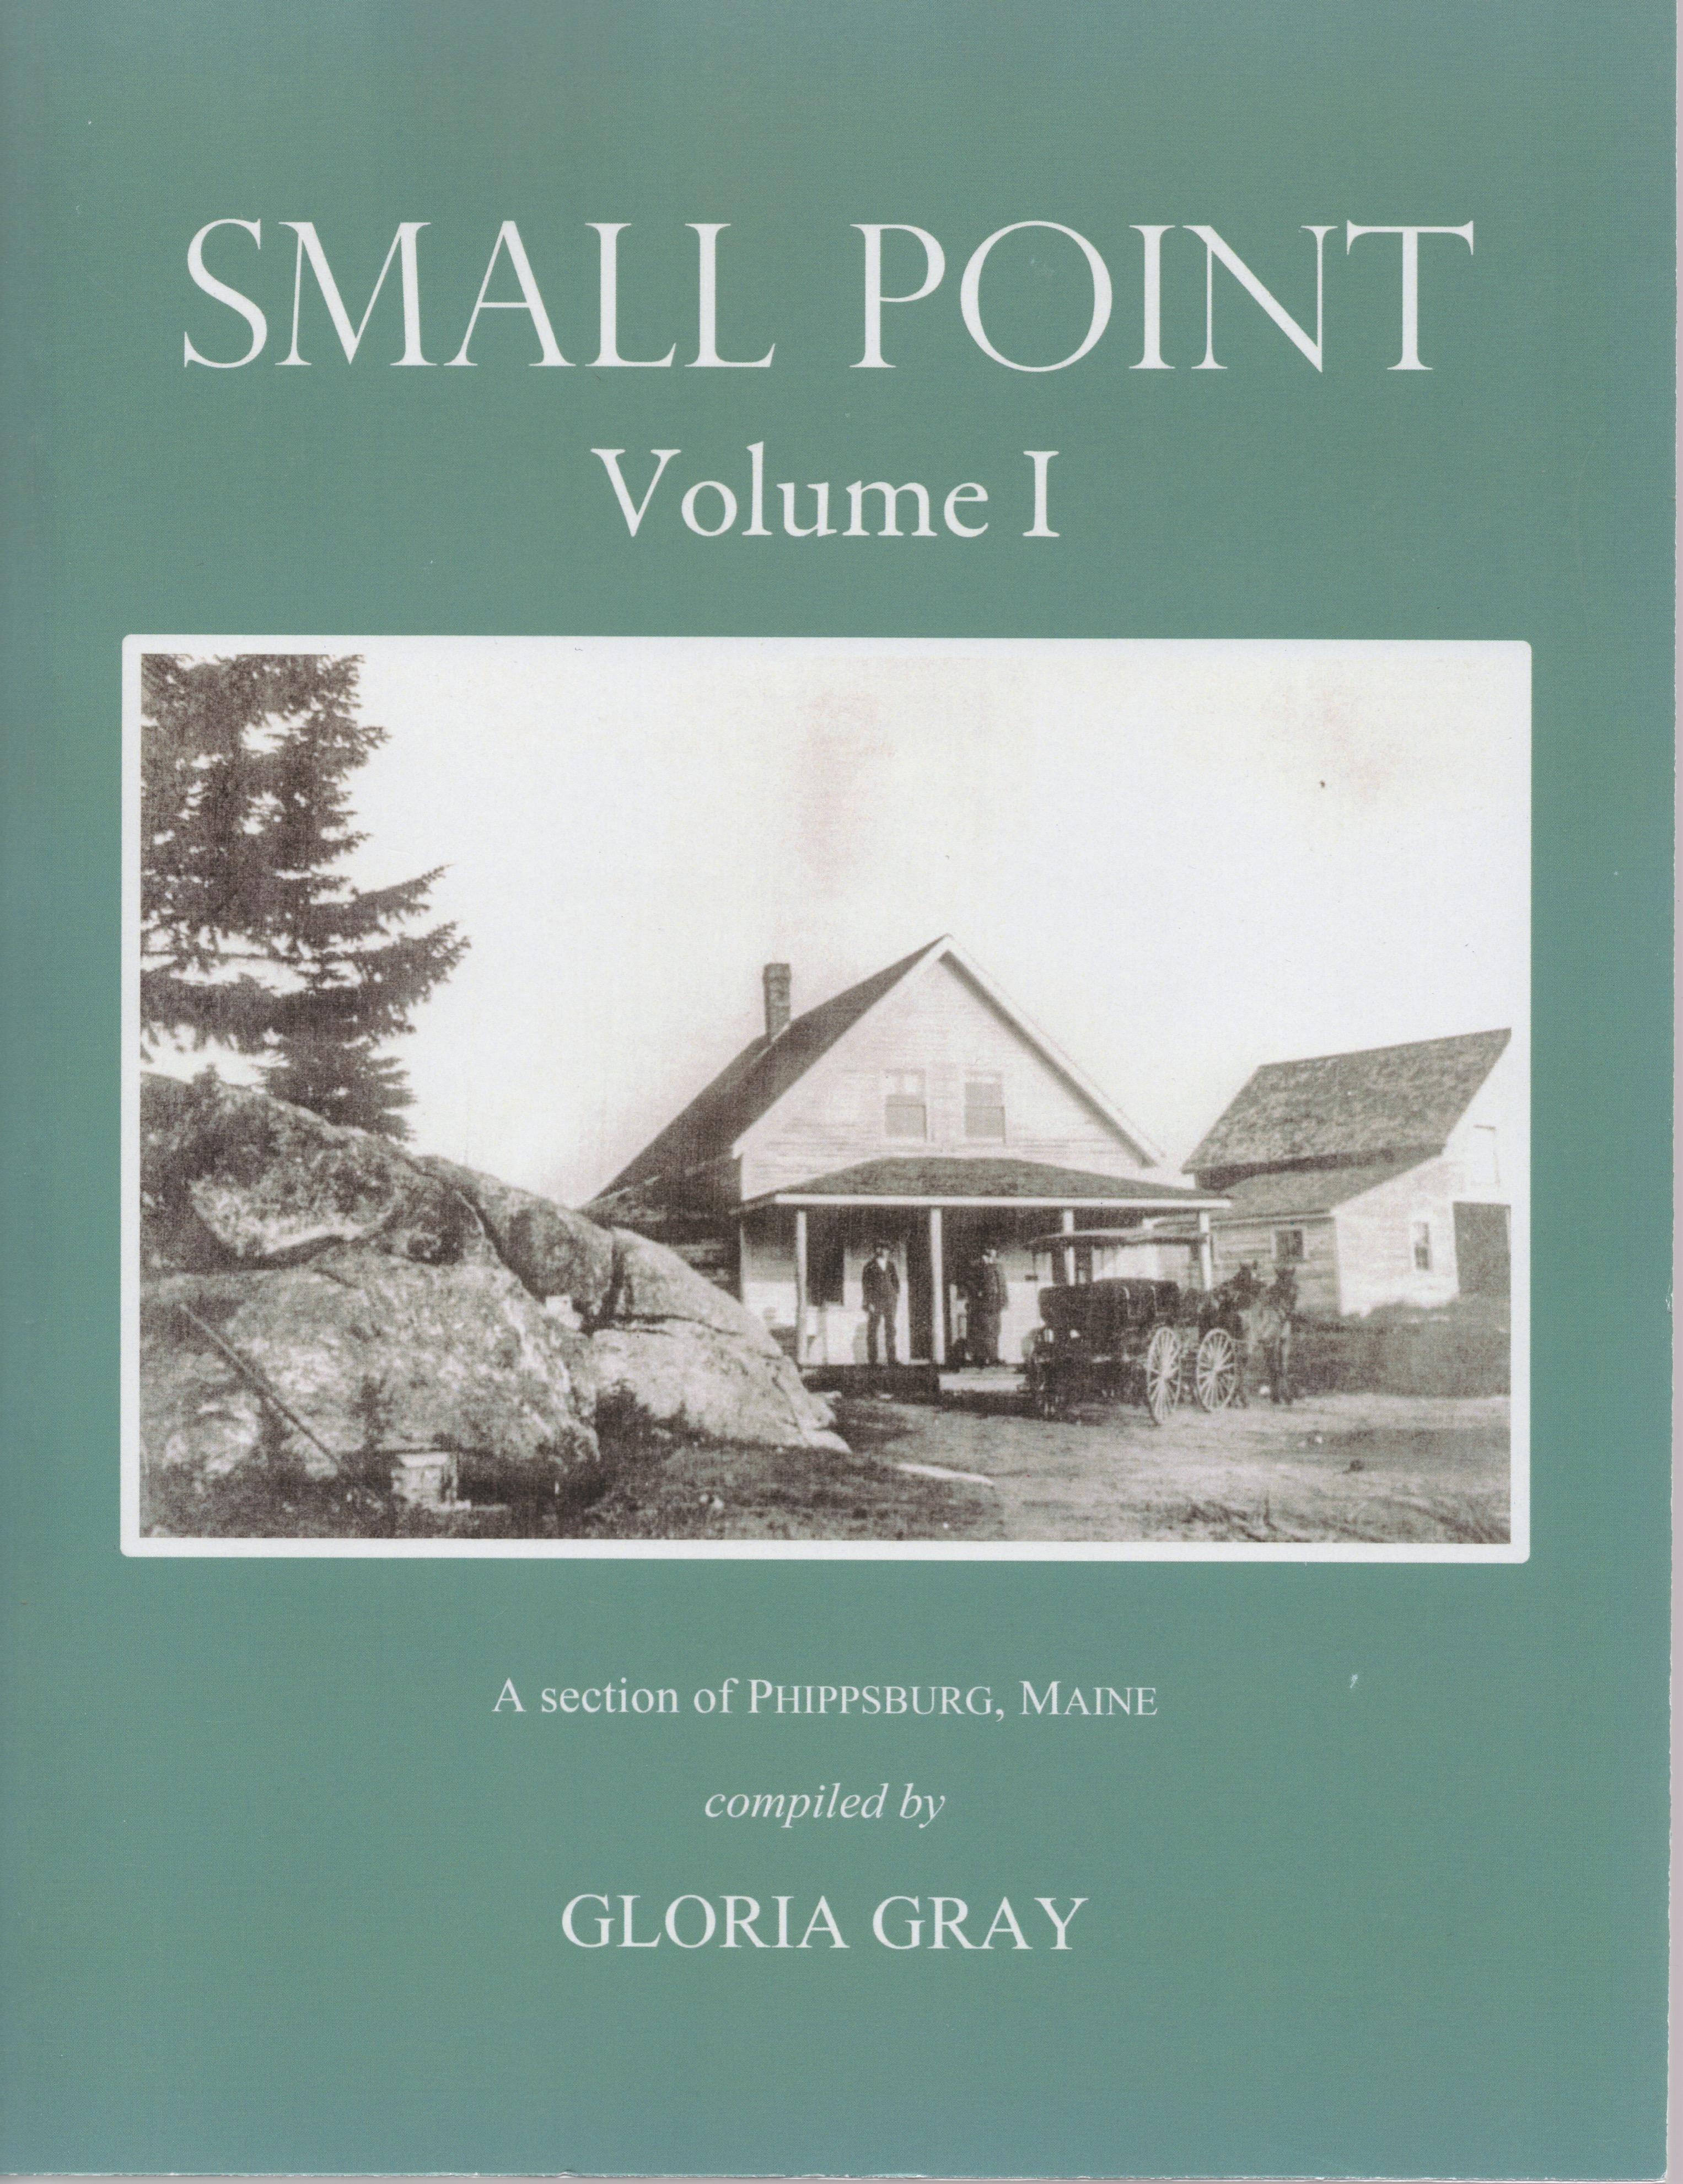 Small Point Volume I